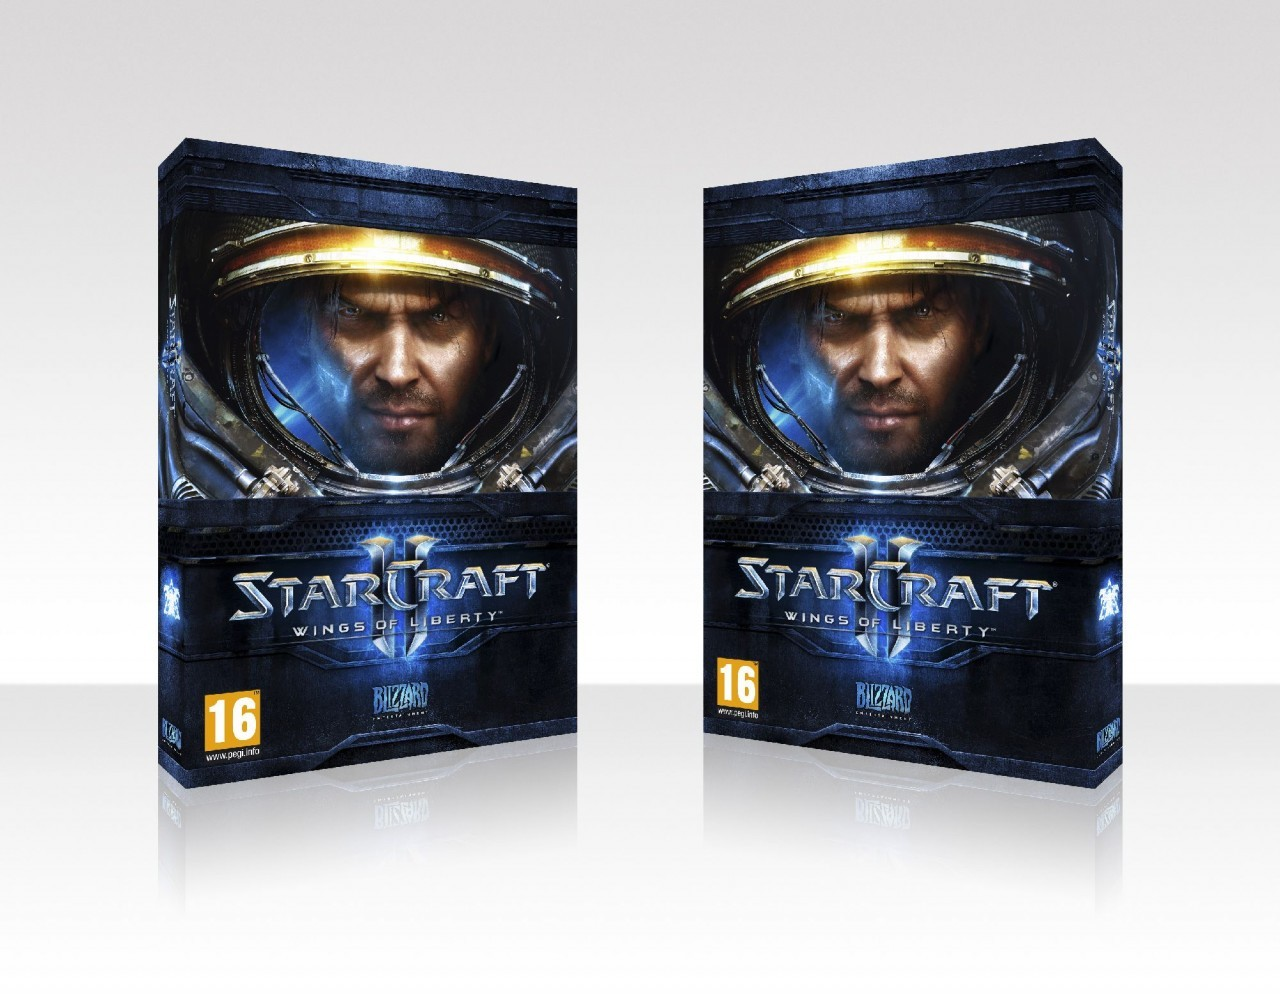 Starcraft 2 wings of liberty deals